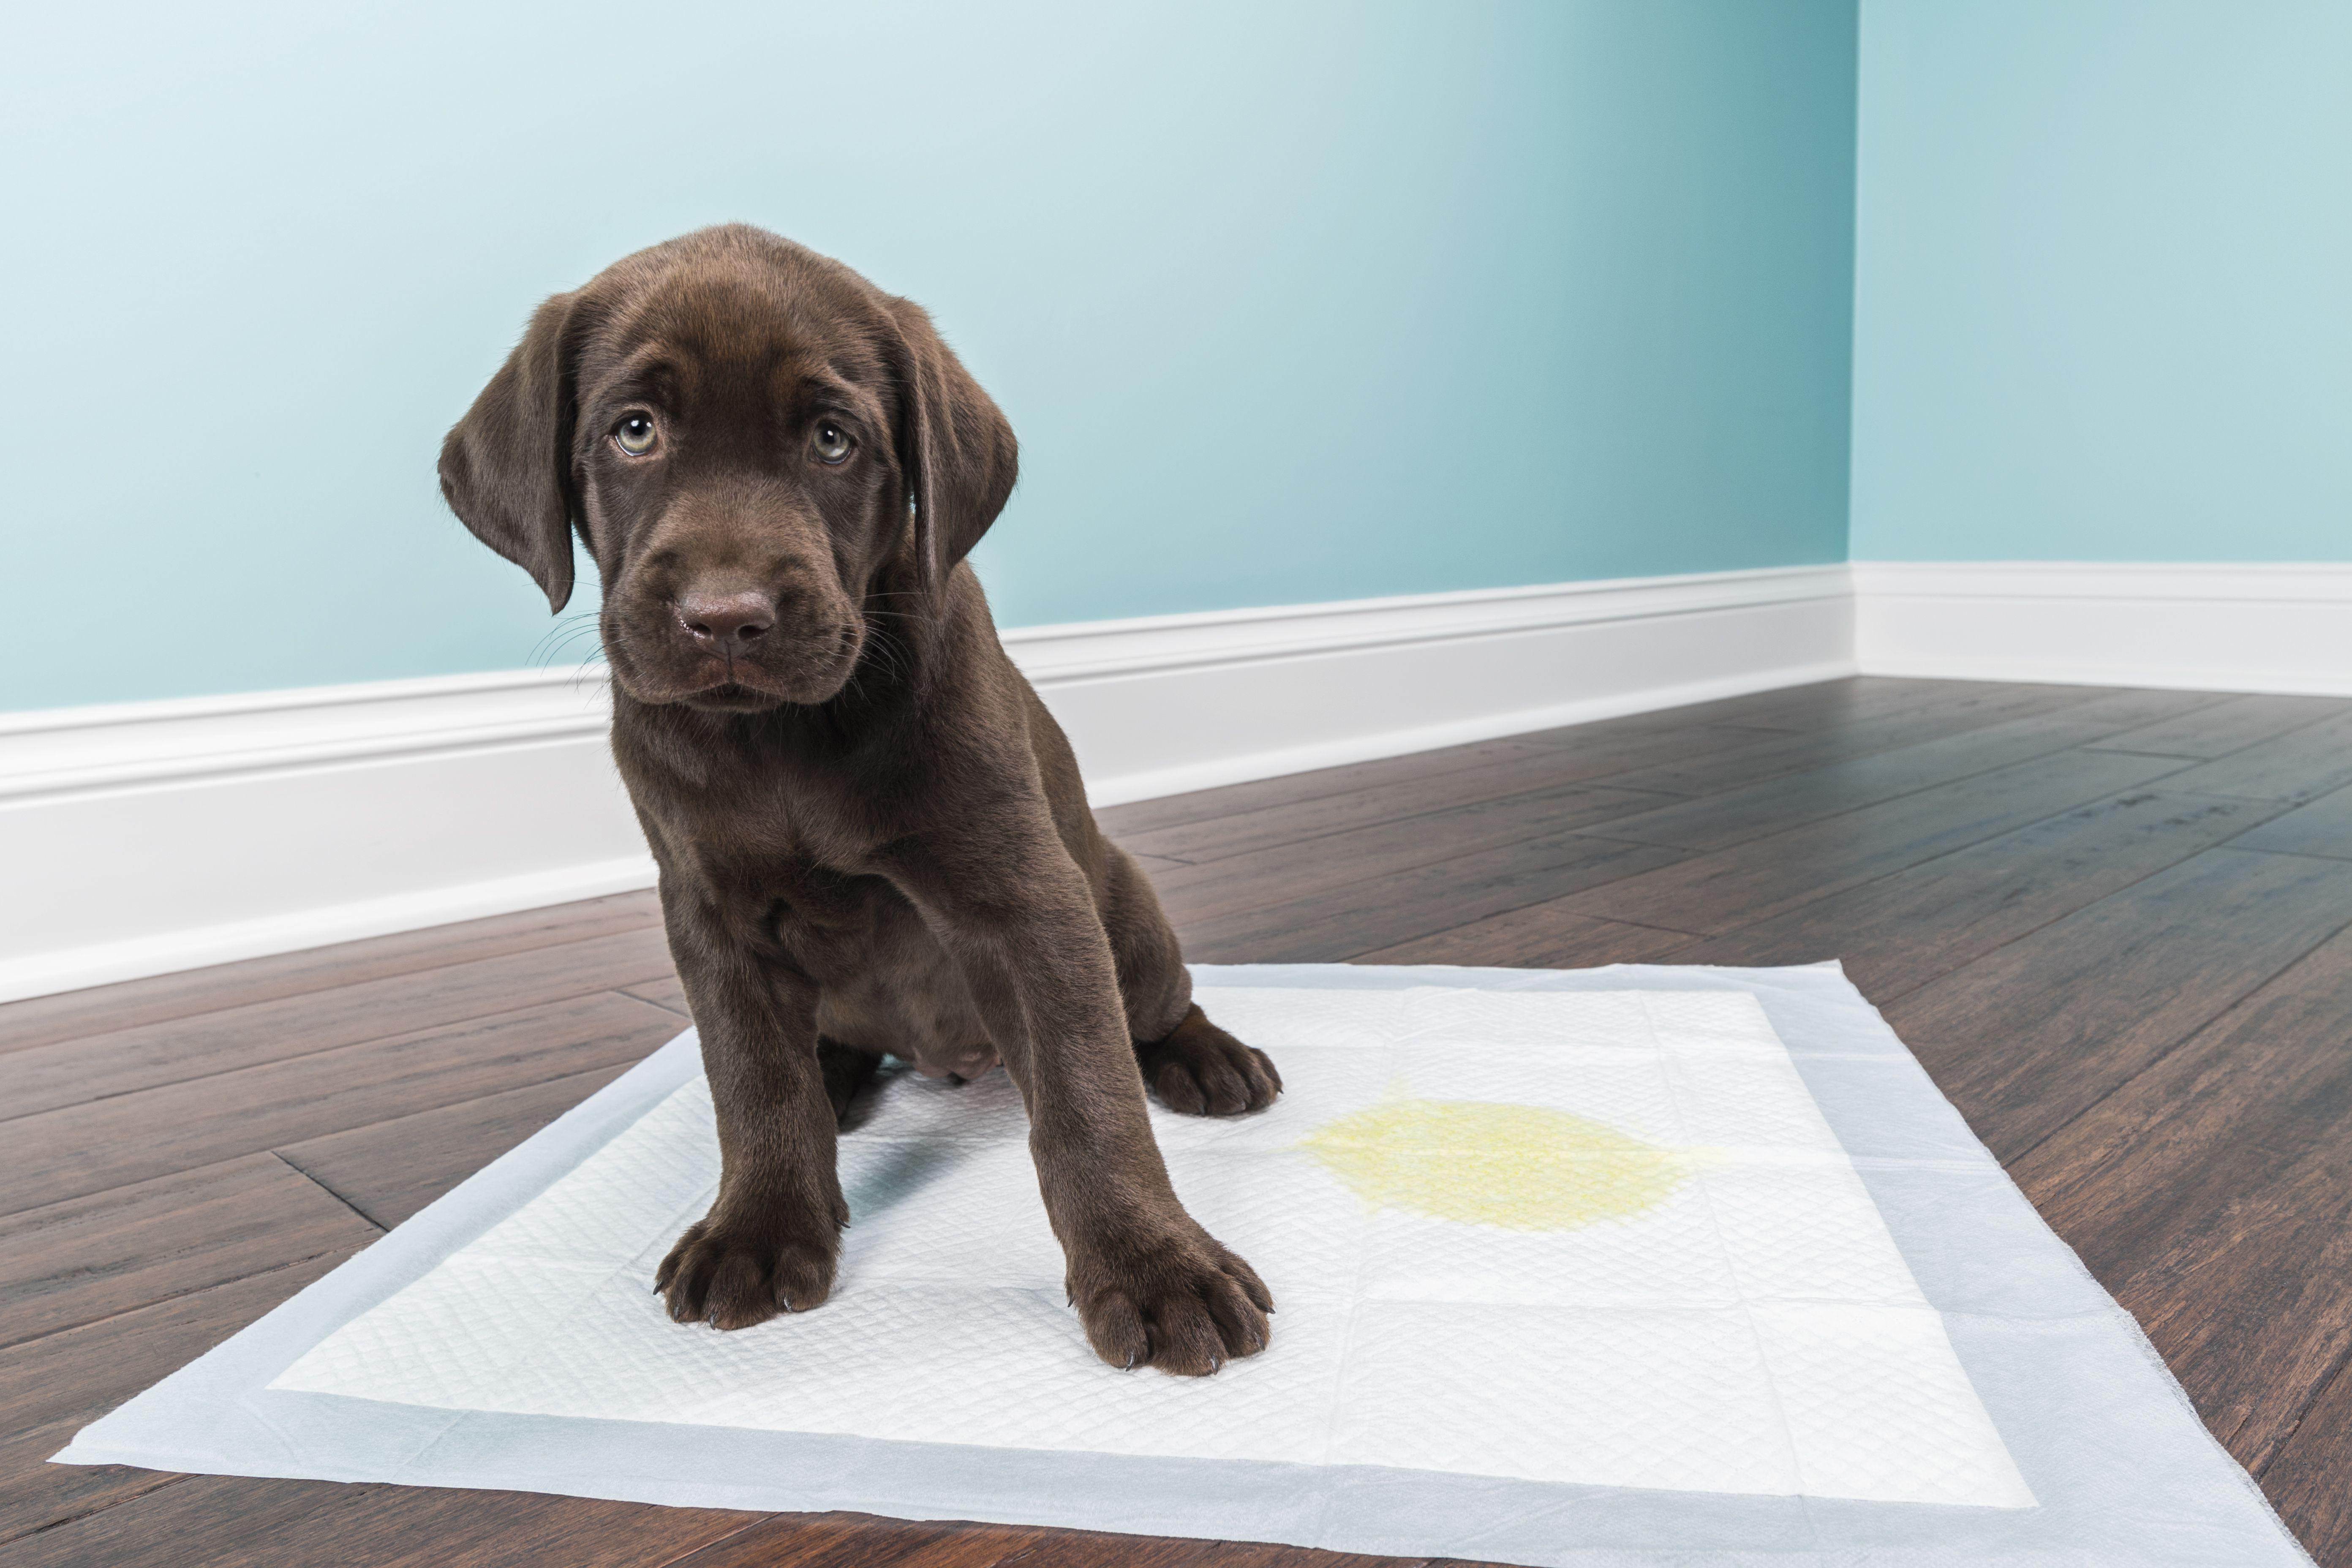 Chocolate Labrador Retriever puppy sitting on the training pad - 8 weeks old